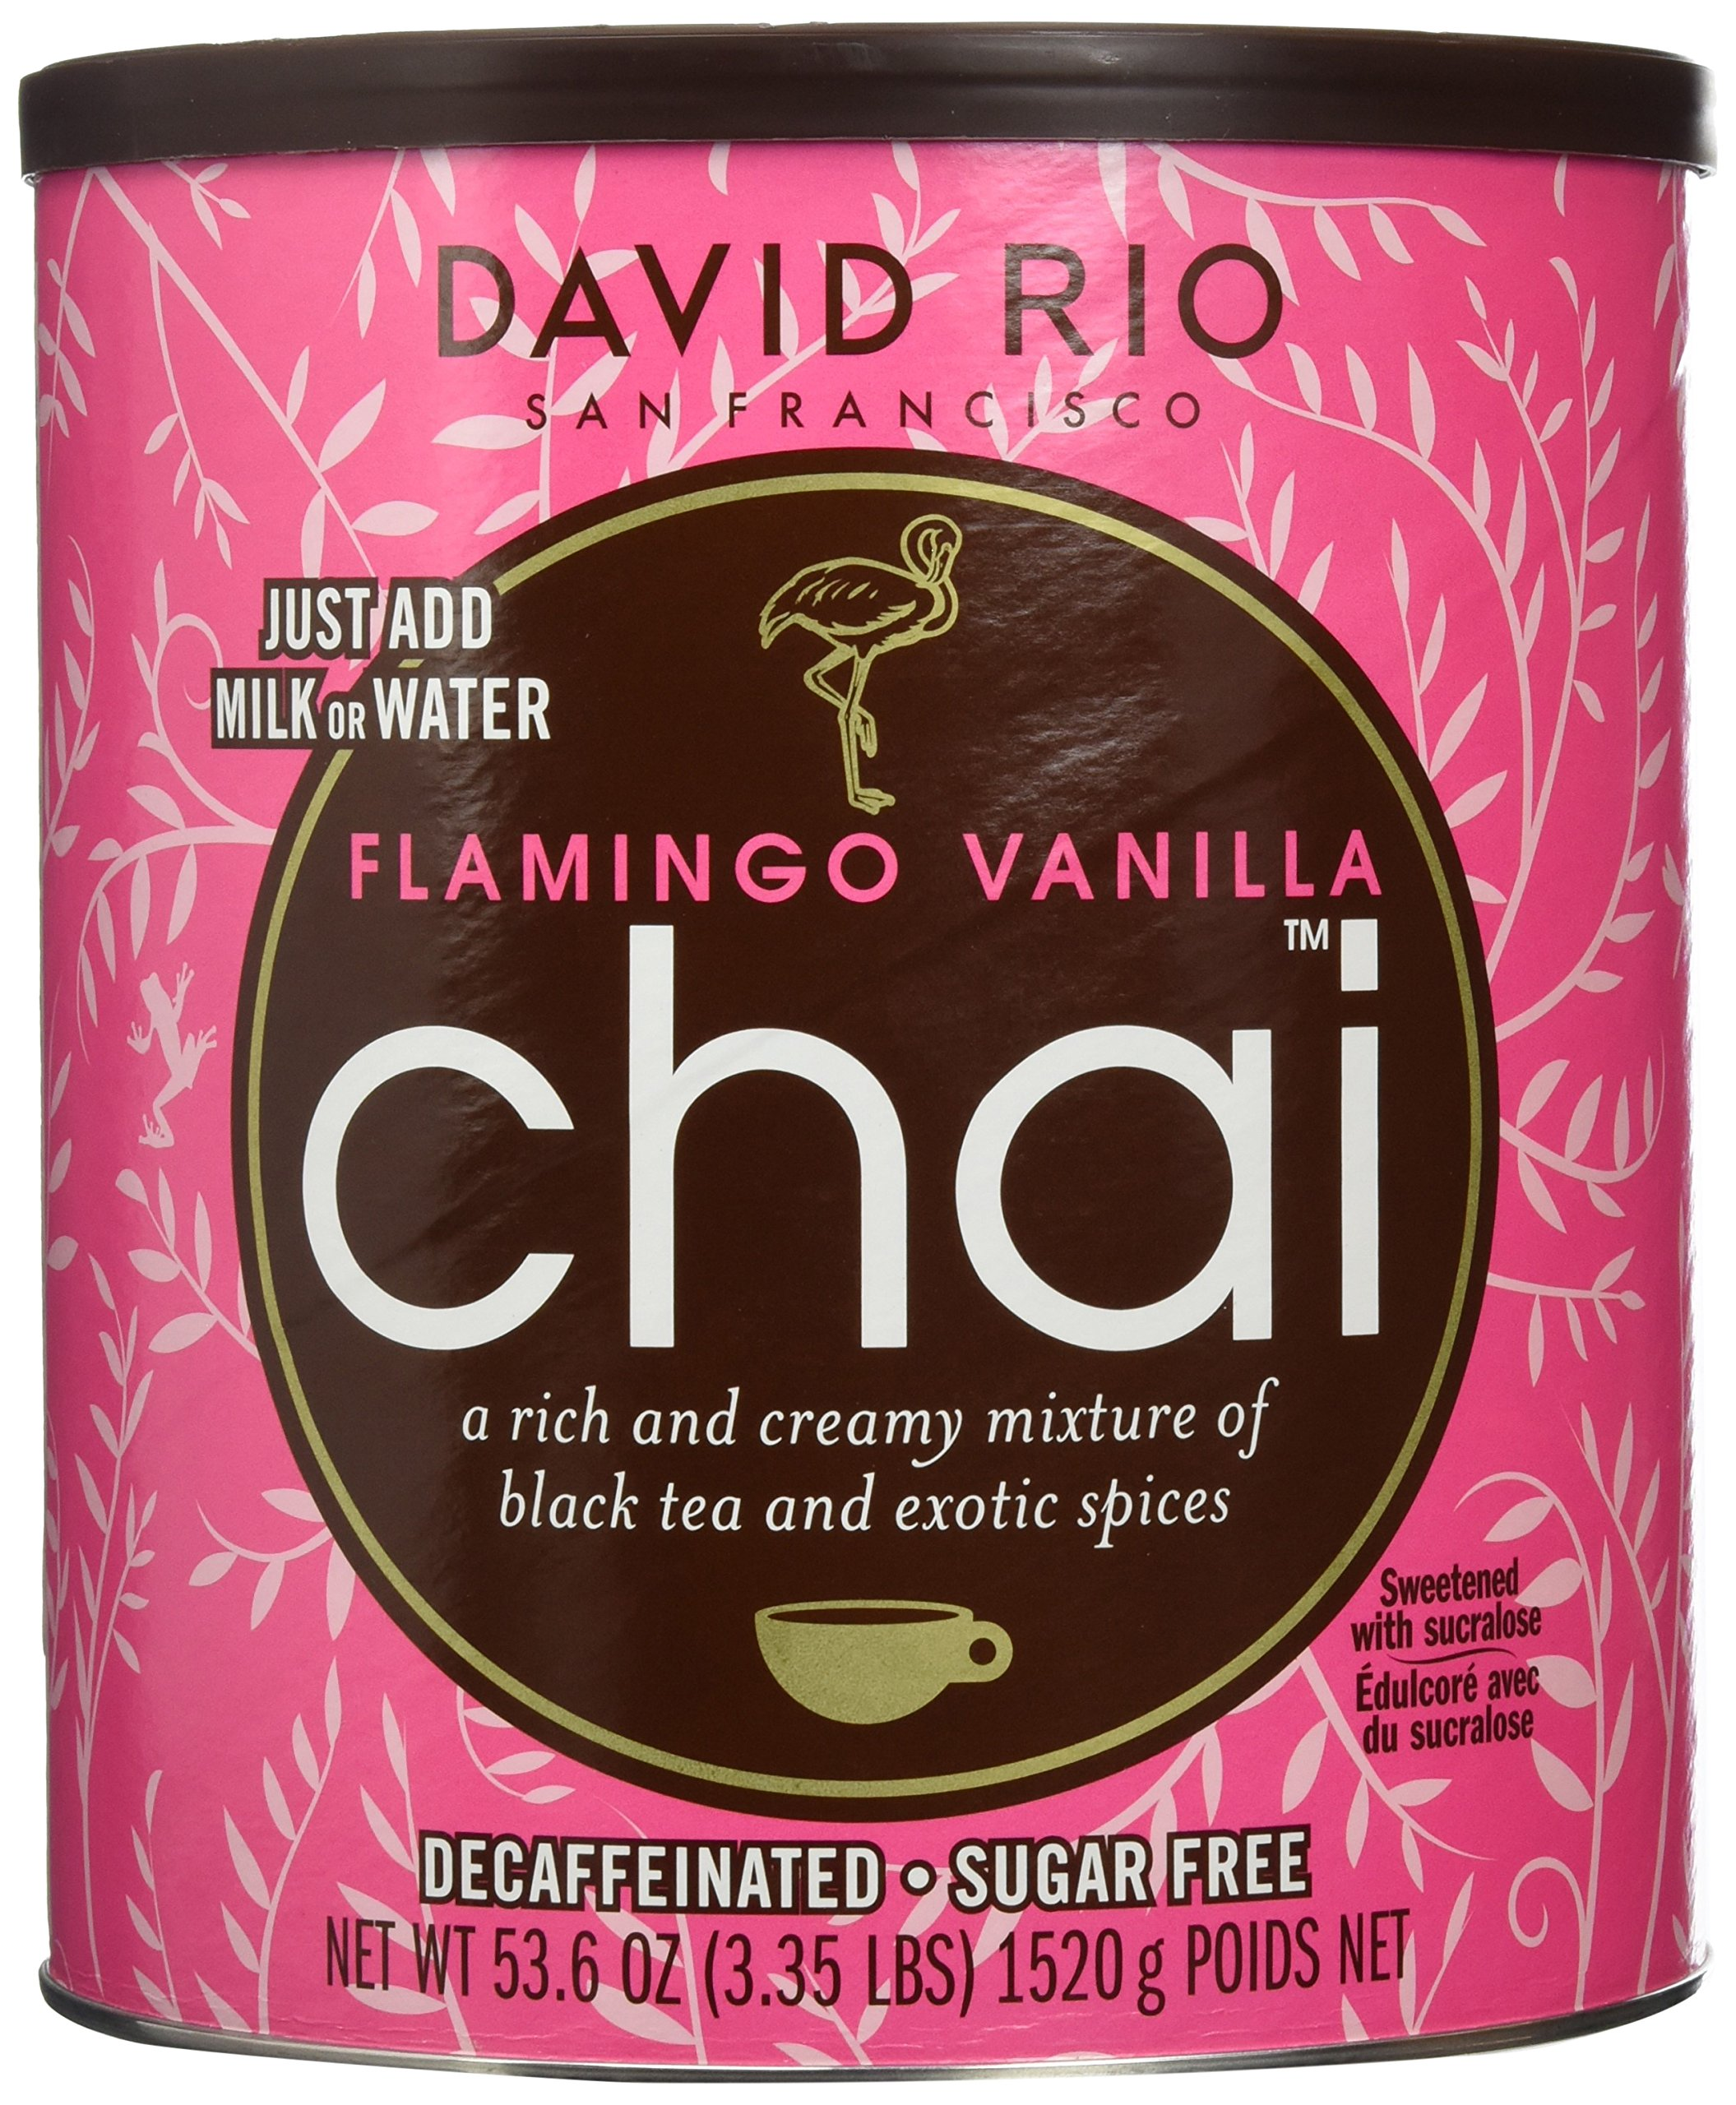 David-Rio-Flamingo-Vanilla-Chai-Pappwickeldose-1-x-152-kg